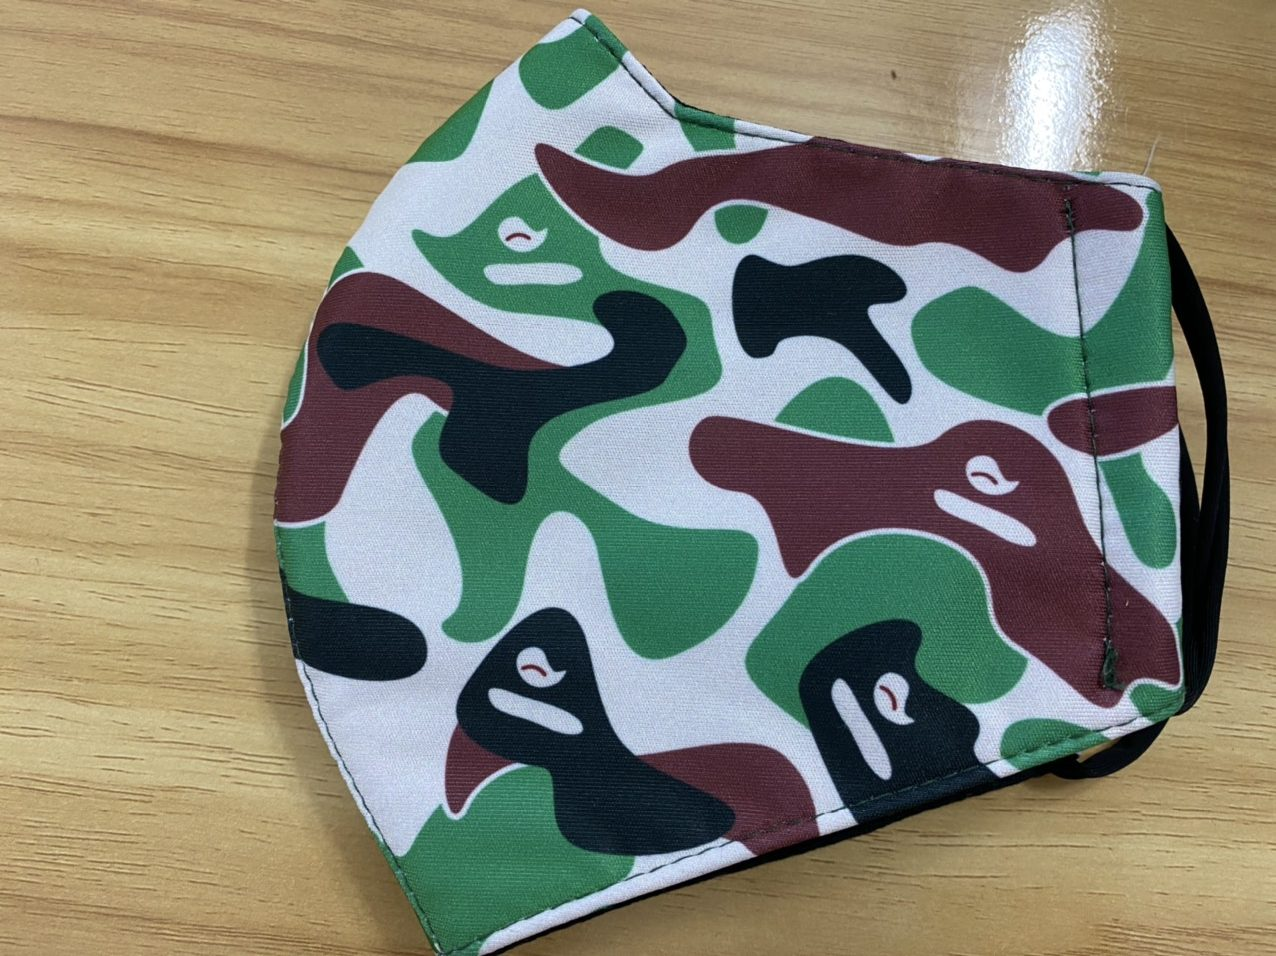 Khẩu Trang Vải Màu Camo 2 Lớp - Mẫu Khẩu Trang In 3D Màu Camo 6